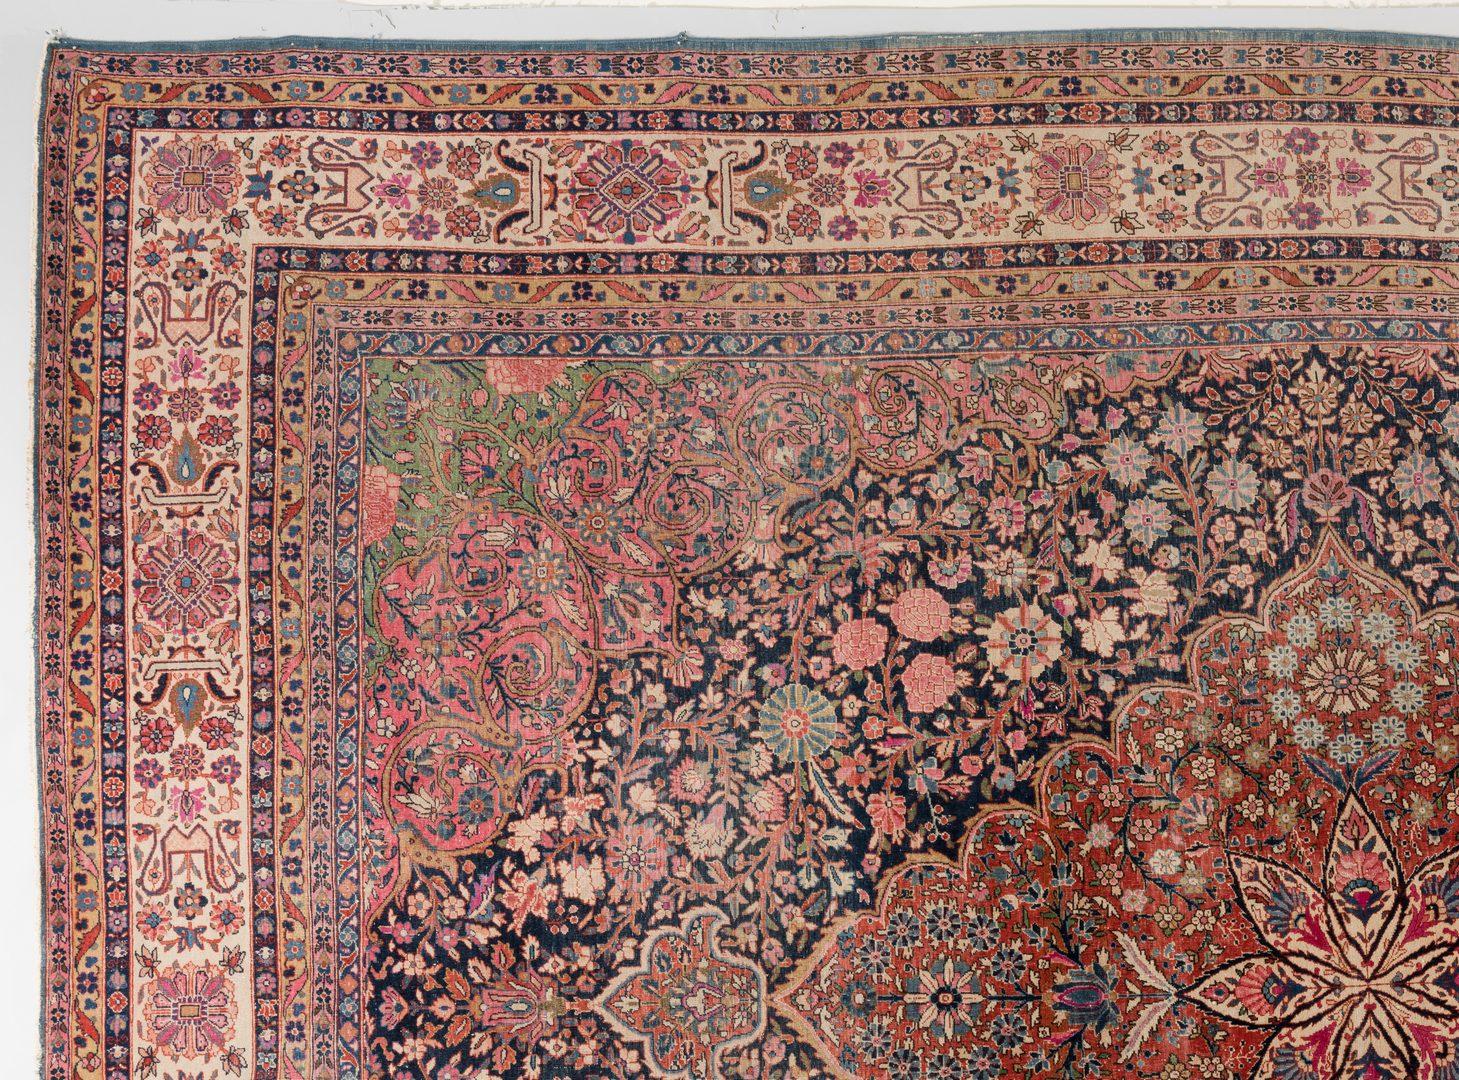 Lot 300: Antique Persian Kashan Carpet